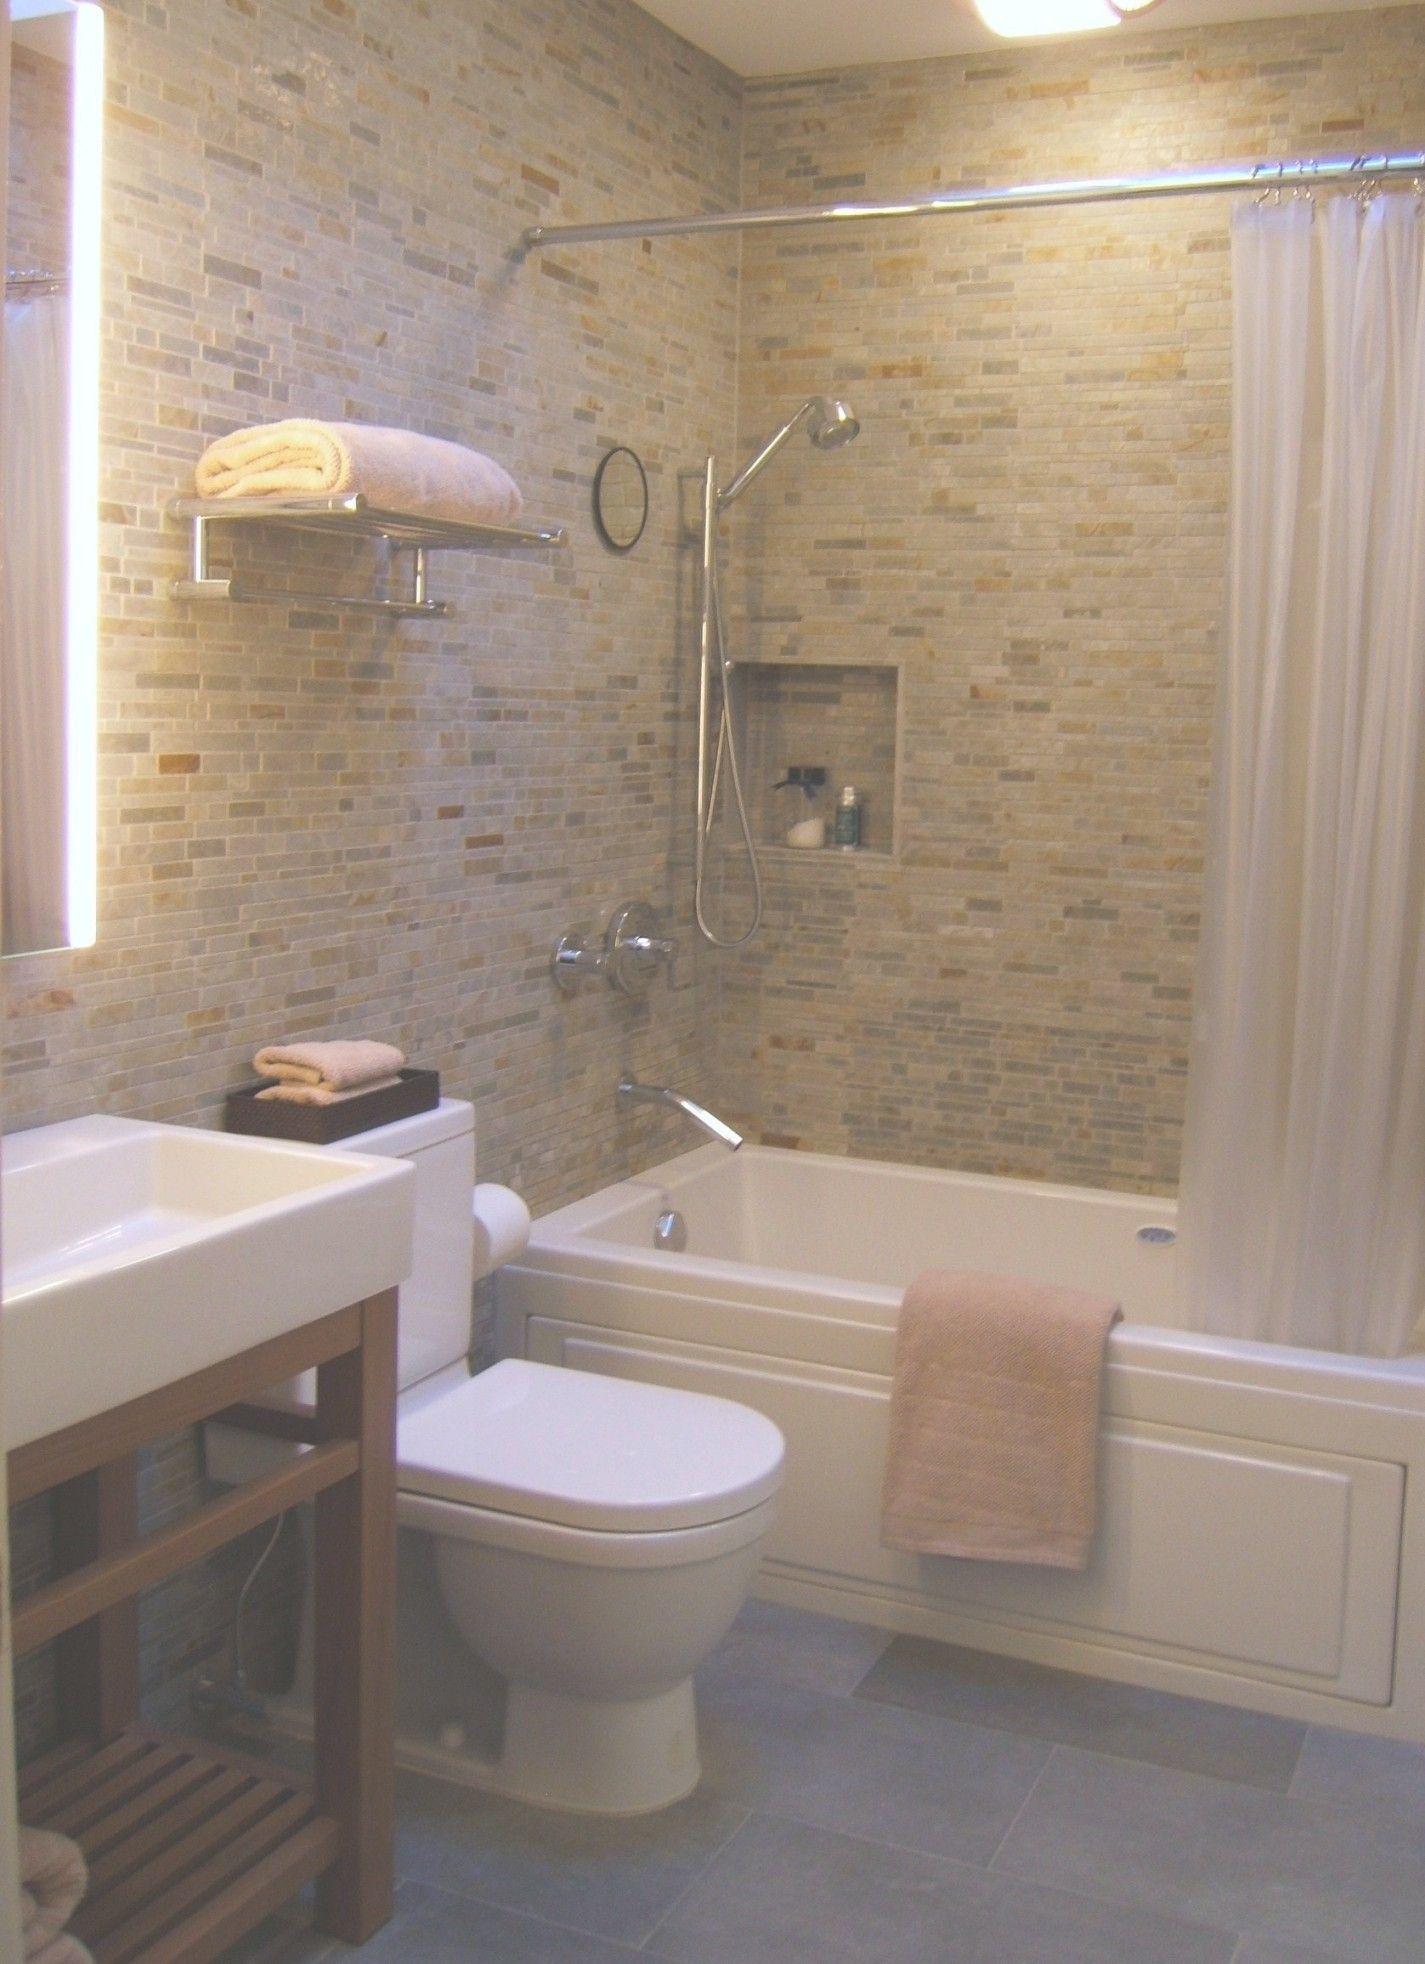 Image Result For Bathroom Floor Plans 5x8 Bathroom Layout Best Bathroom Designs Small Bathroom